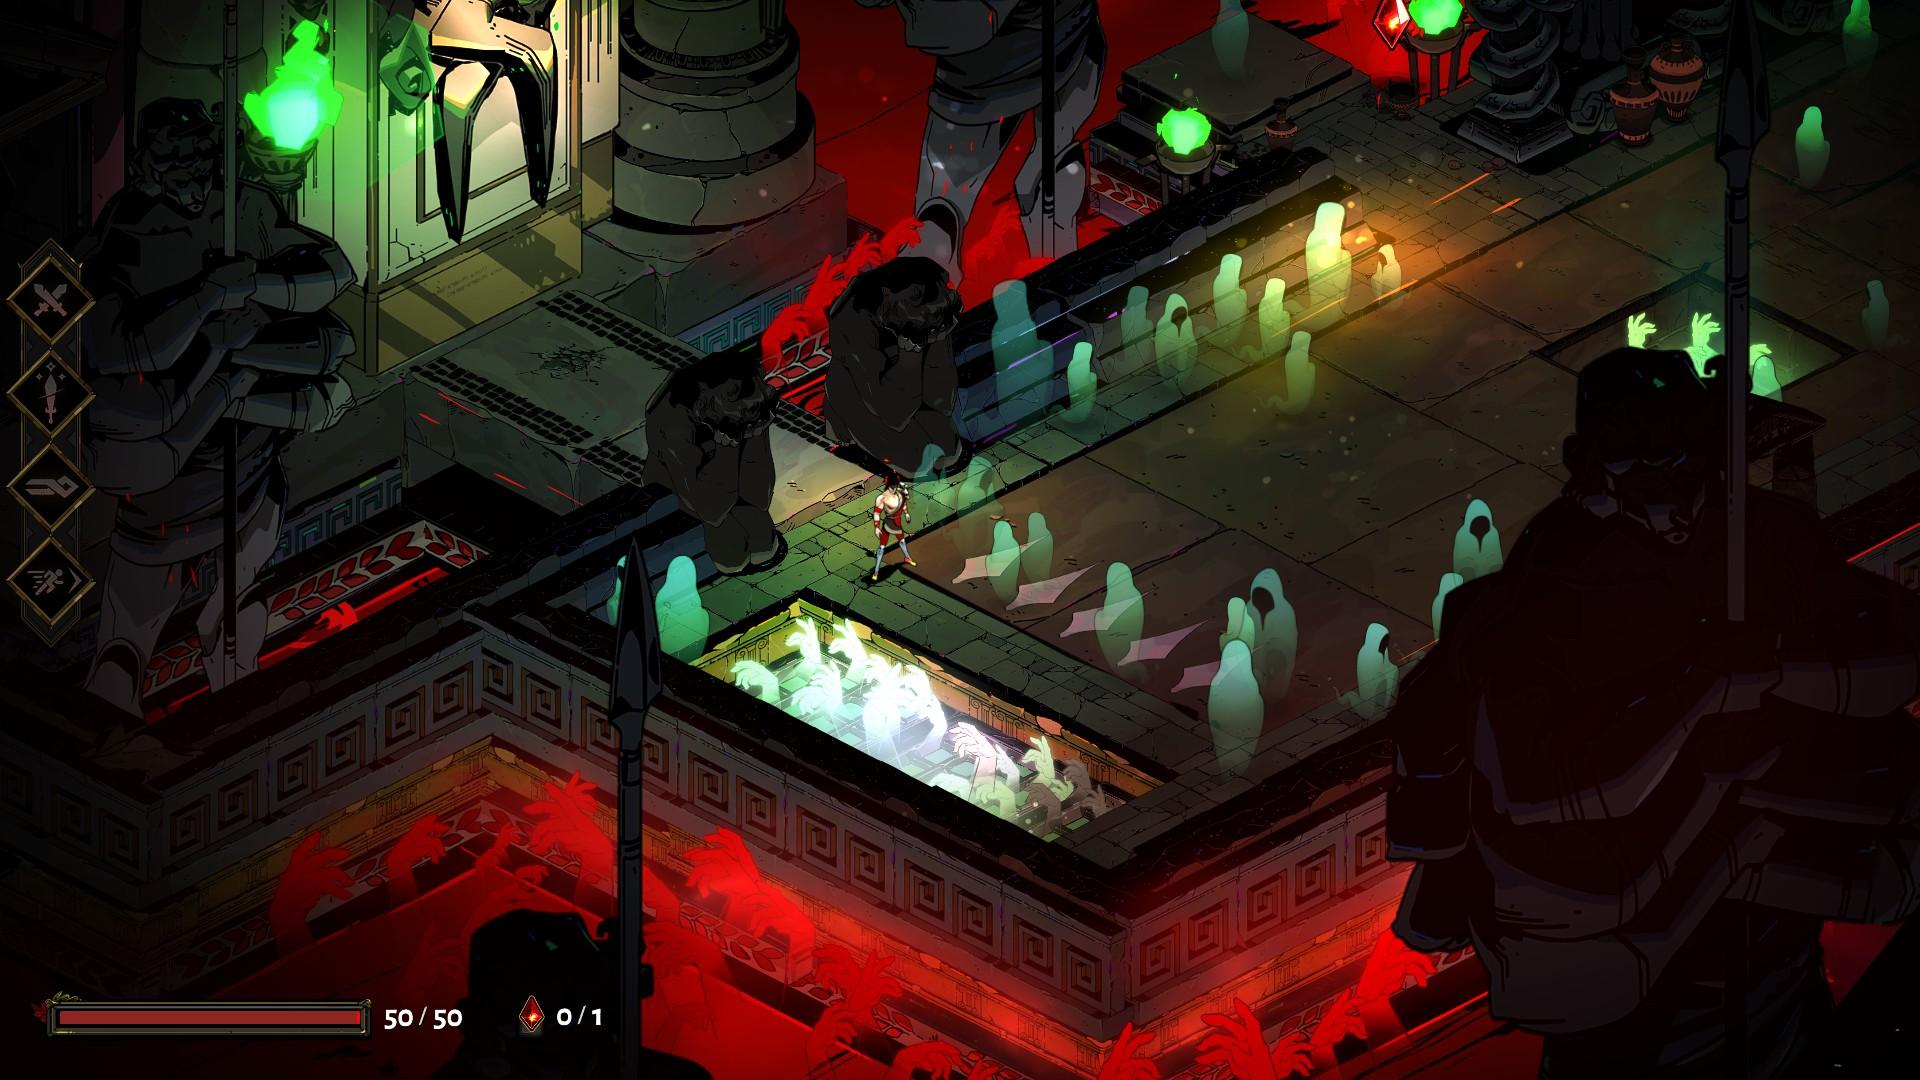 Beginning of Tartarus, full of ghosts and creepy hands.